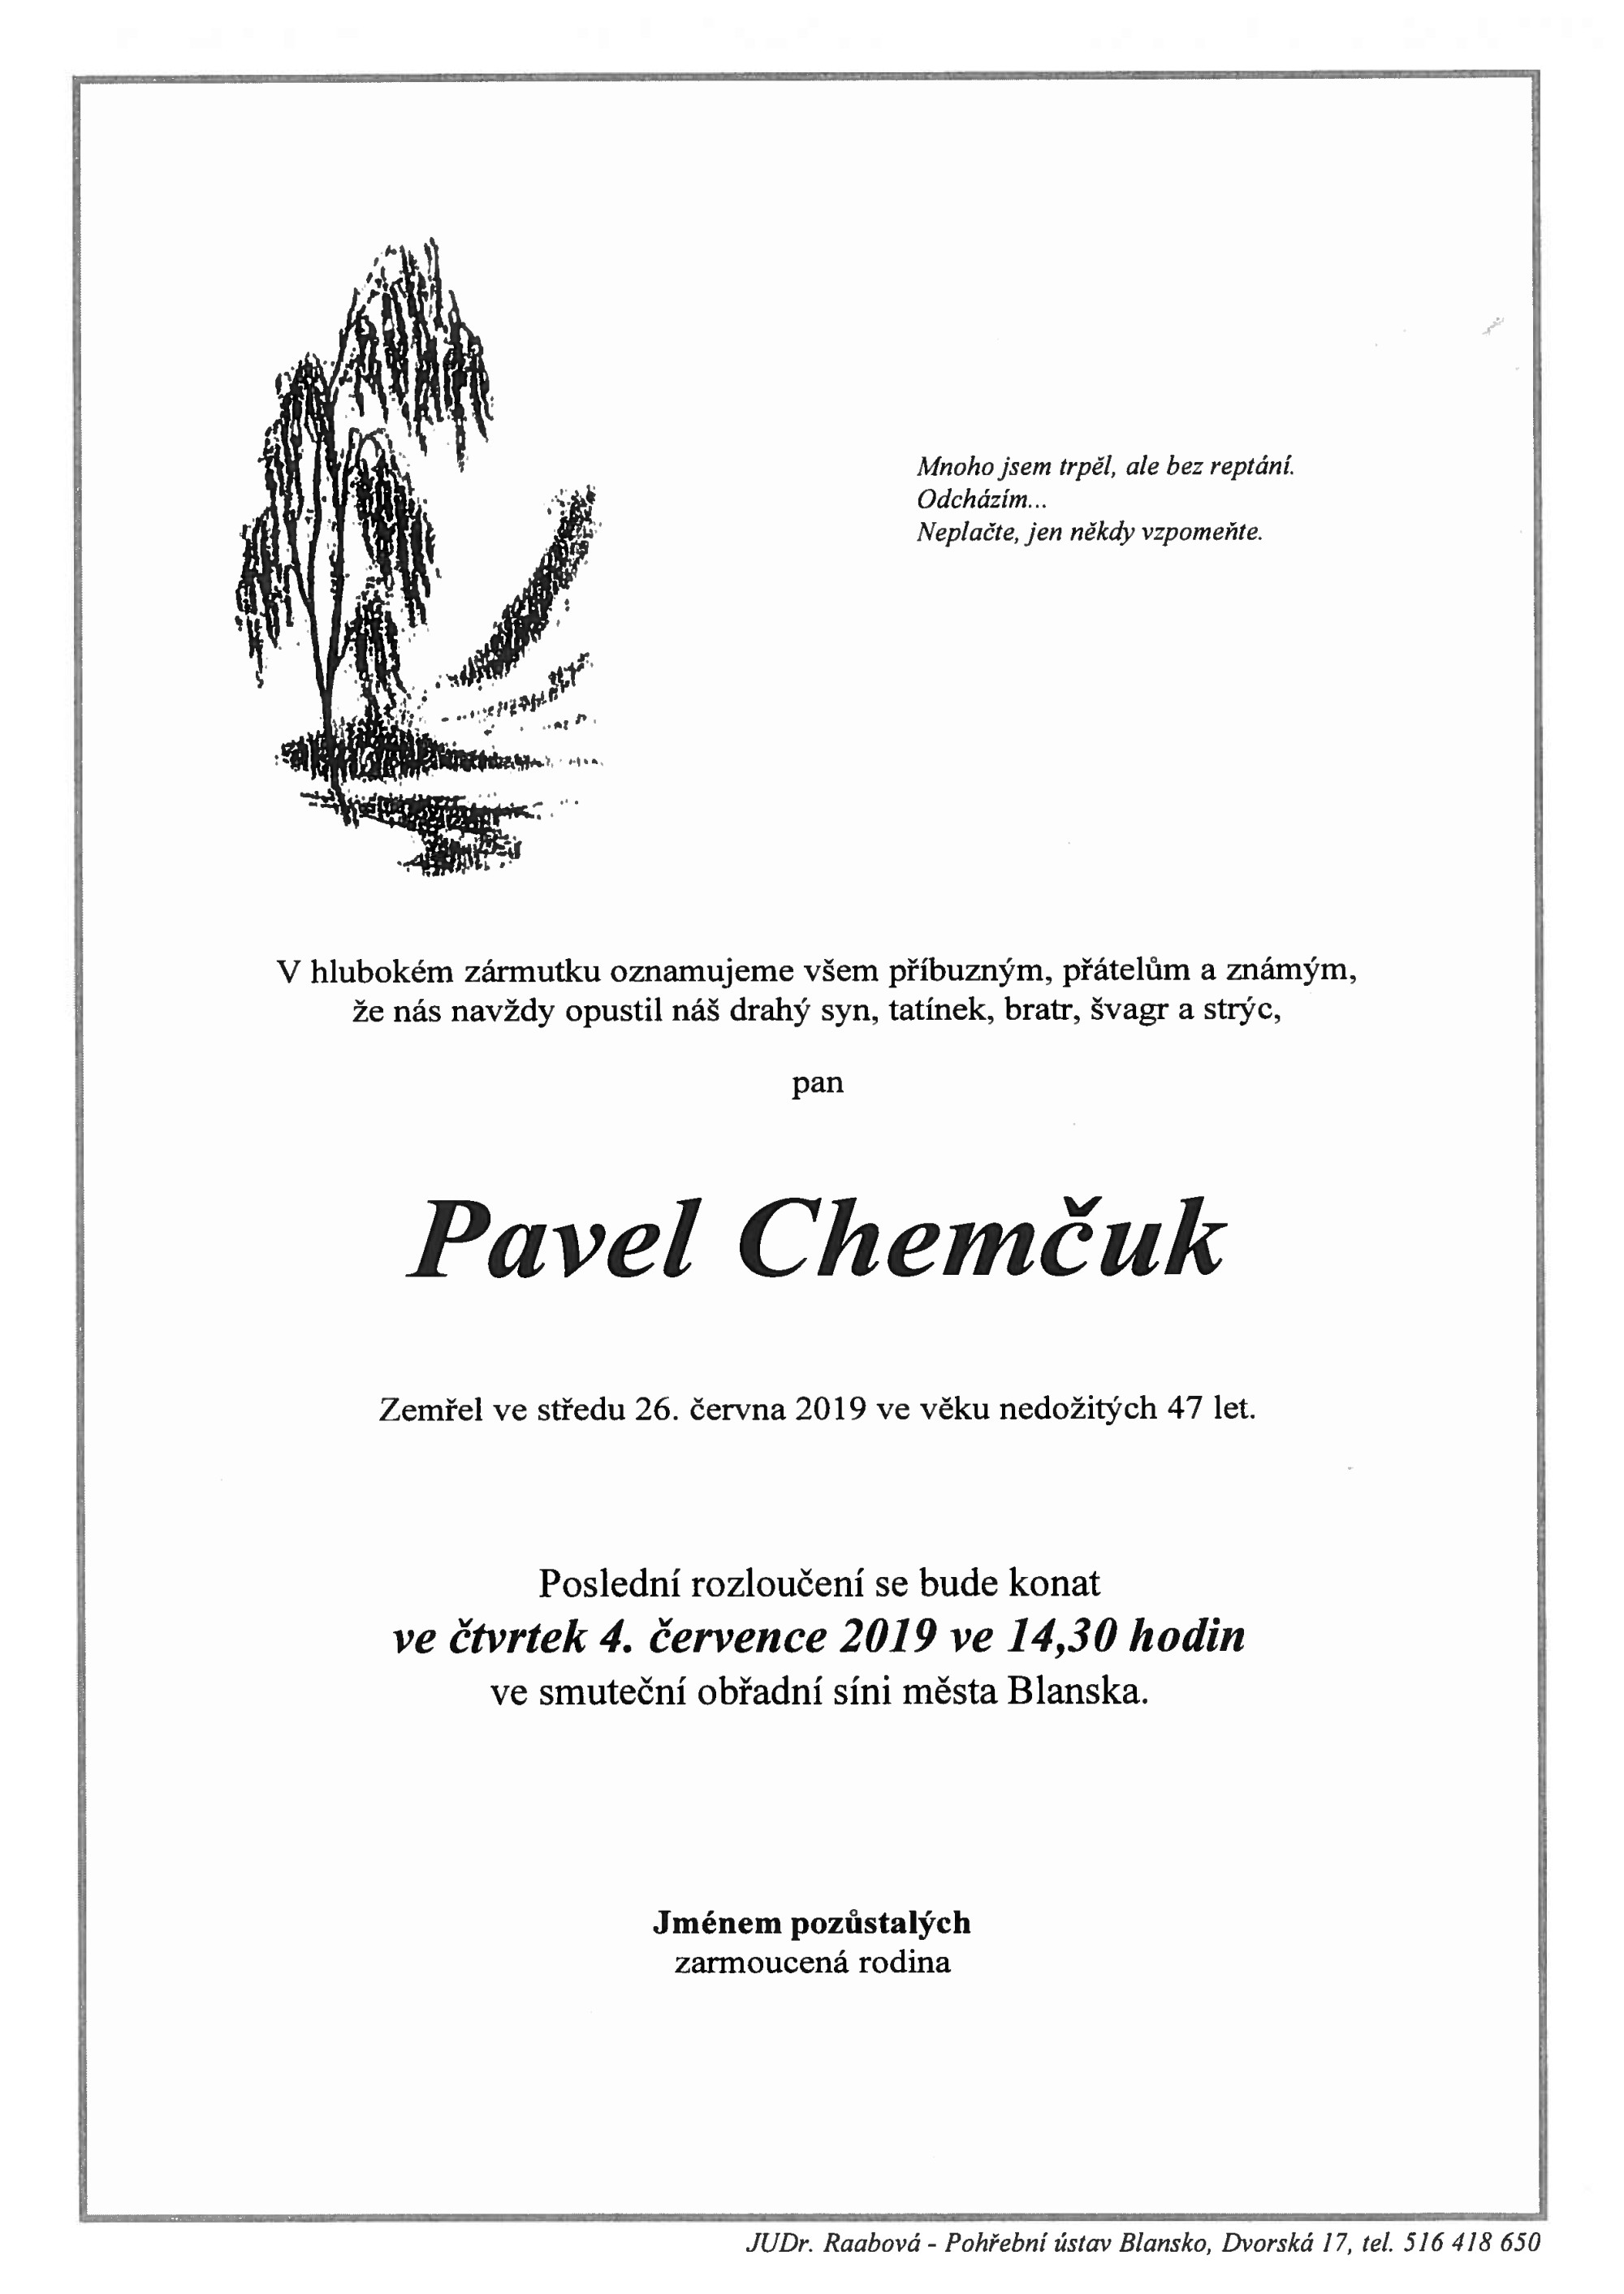 Pavel Chemčuk